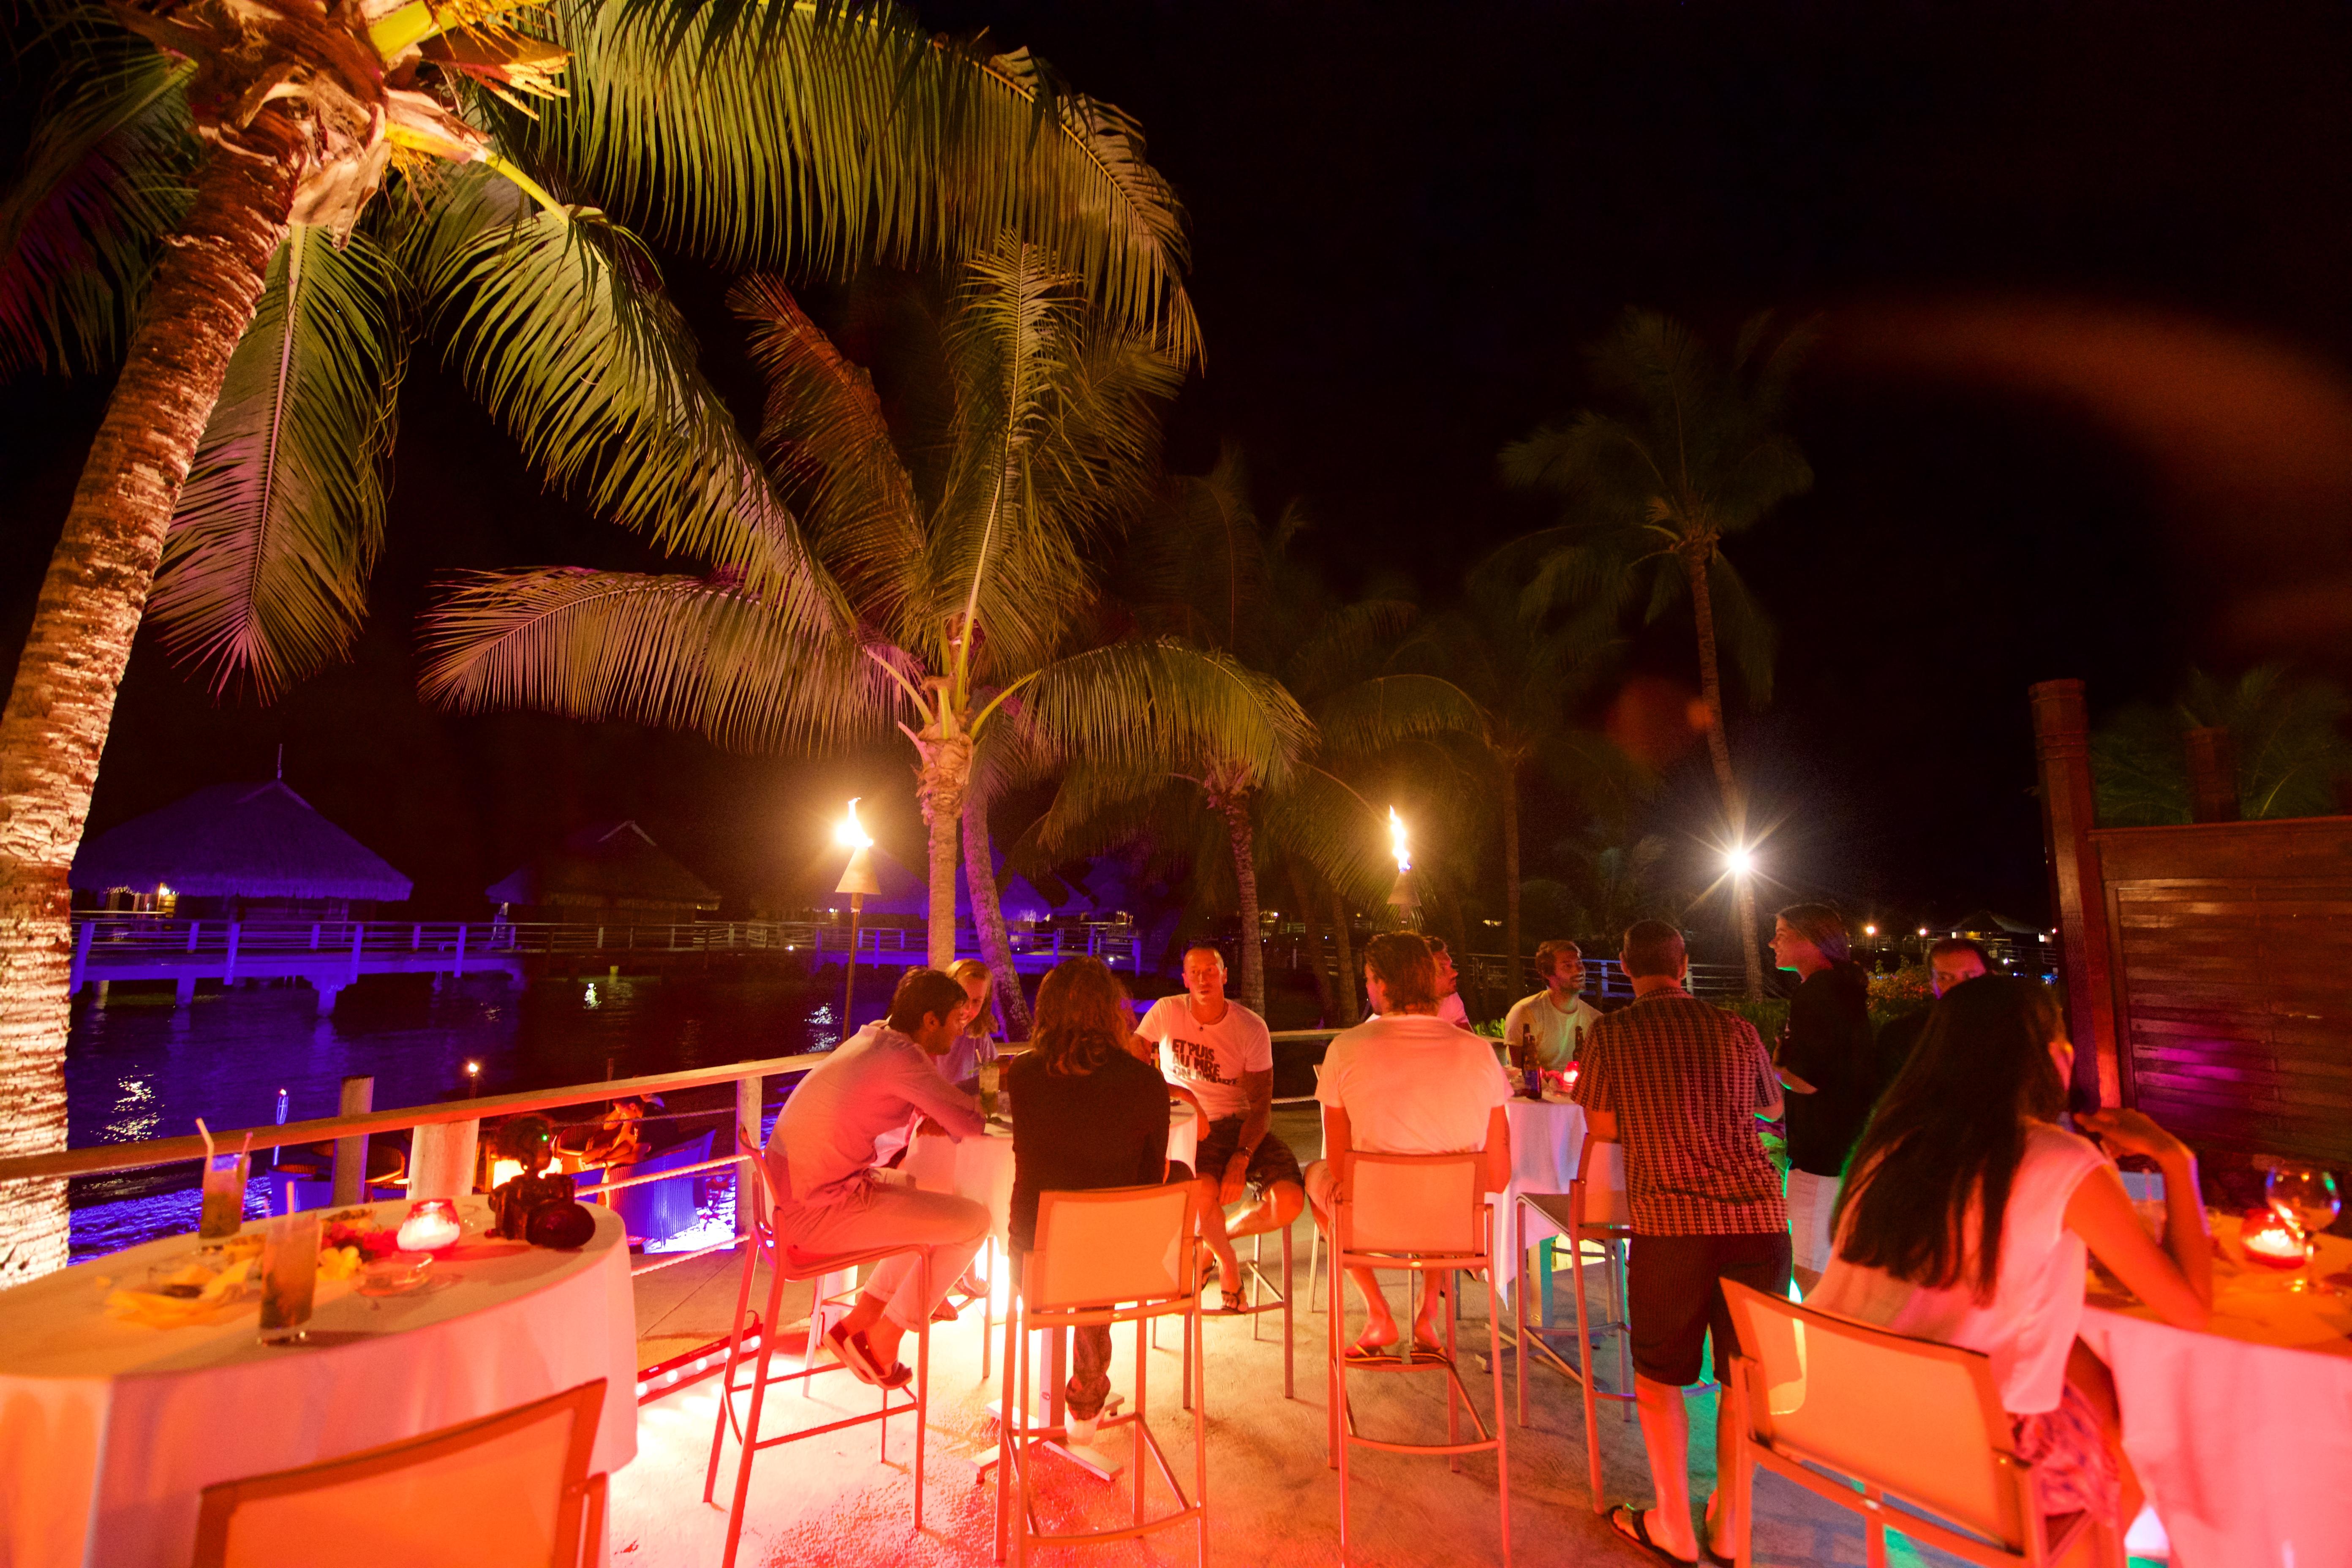 https://tahititourisme.kr/wp-content/uploads/2018/03/RESTAURATION-Matahiehani-Lounge-Bar-featured_image-Tim_McKenna.jpg